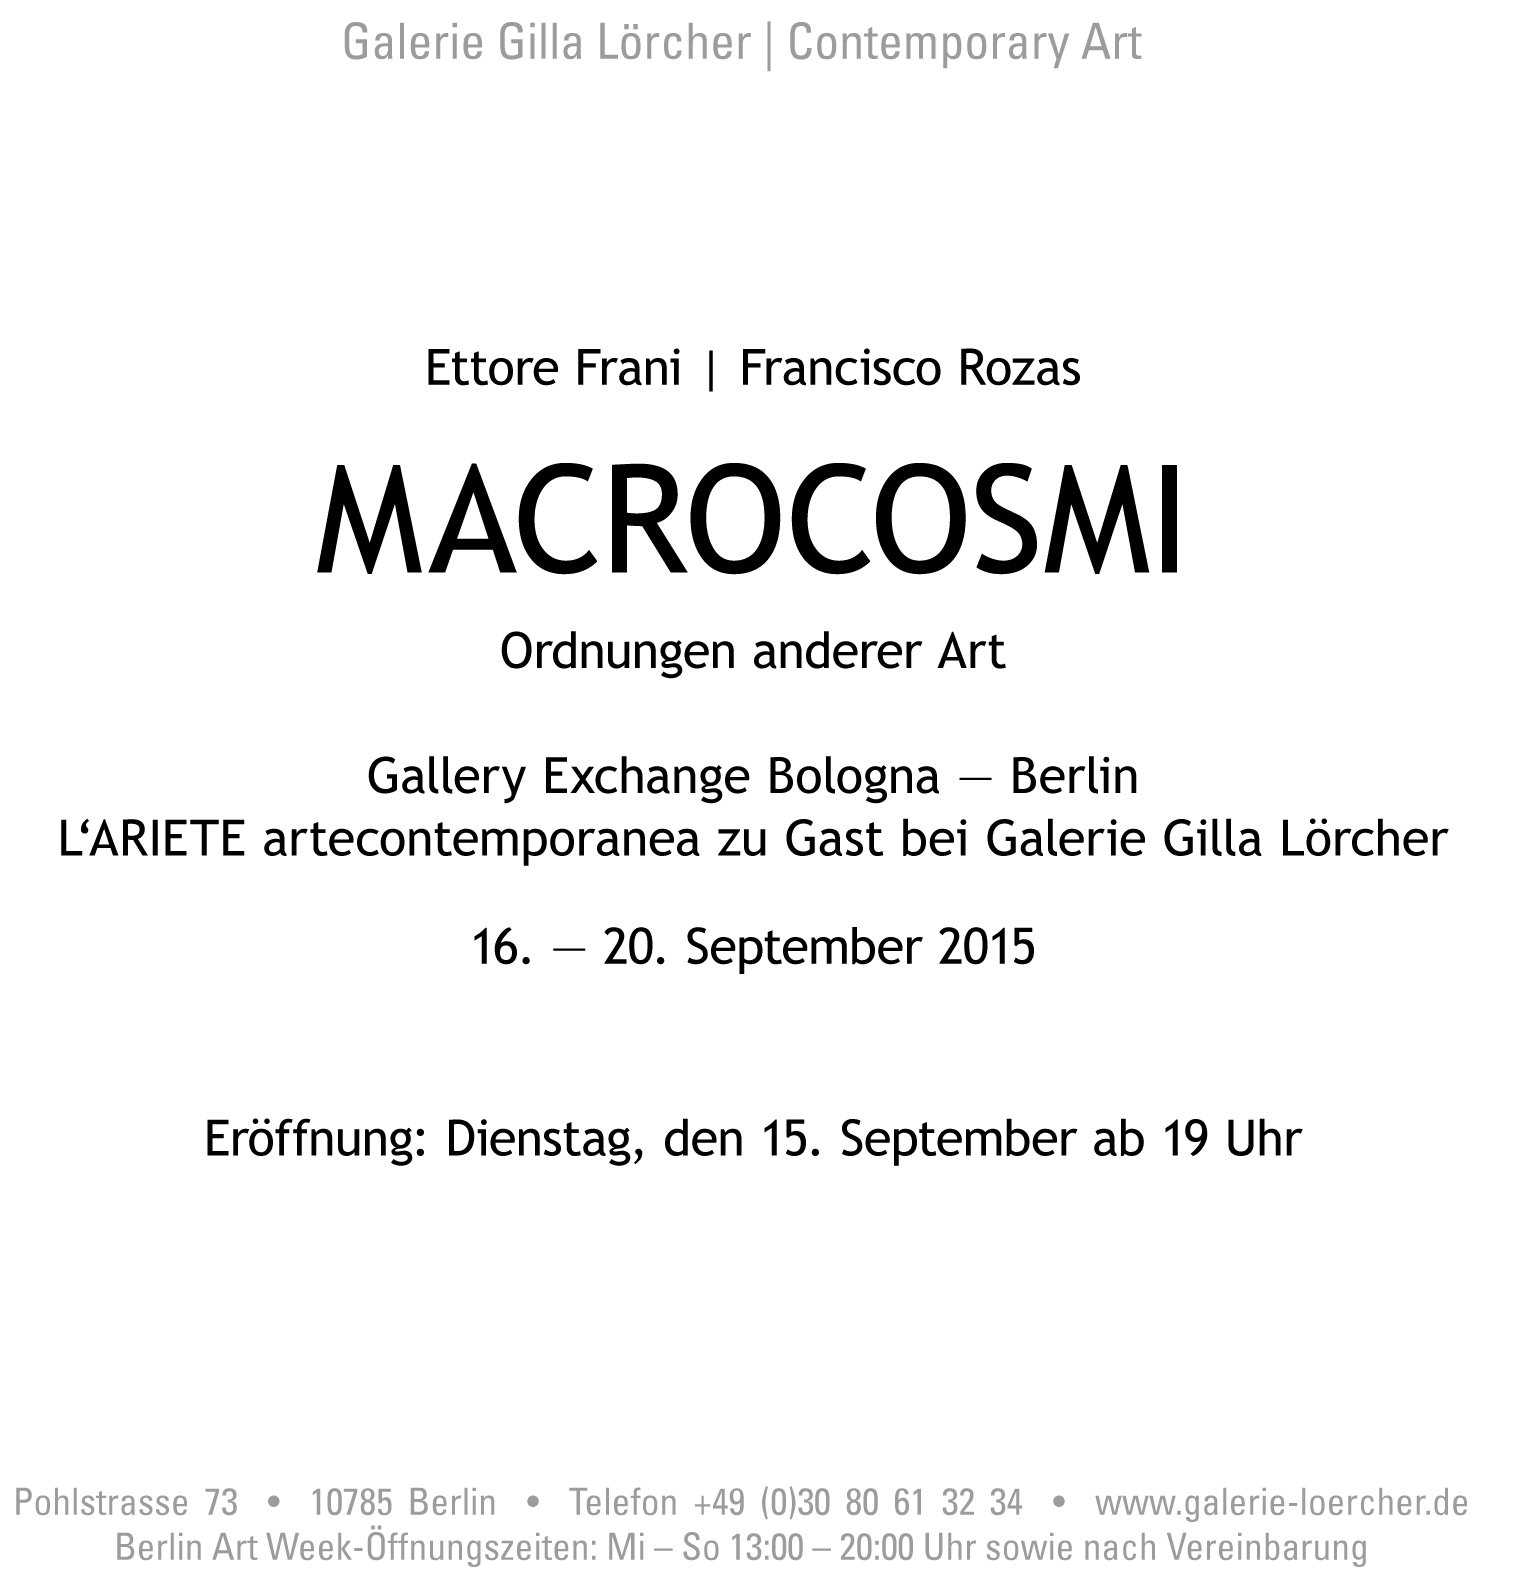 Invitation MACROCOSMI FranciscoRozas EttoreFrani at GalerieGillaLoercher 15092015-2.jpg